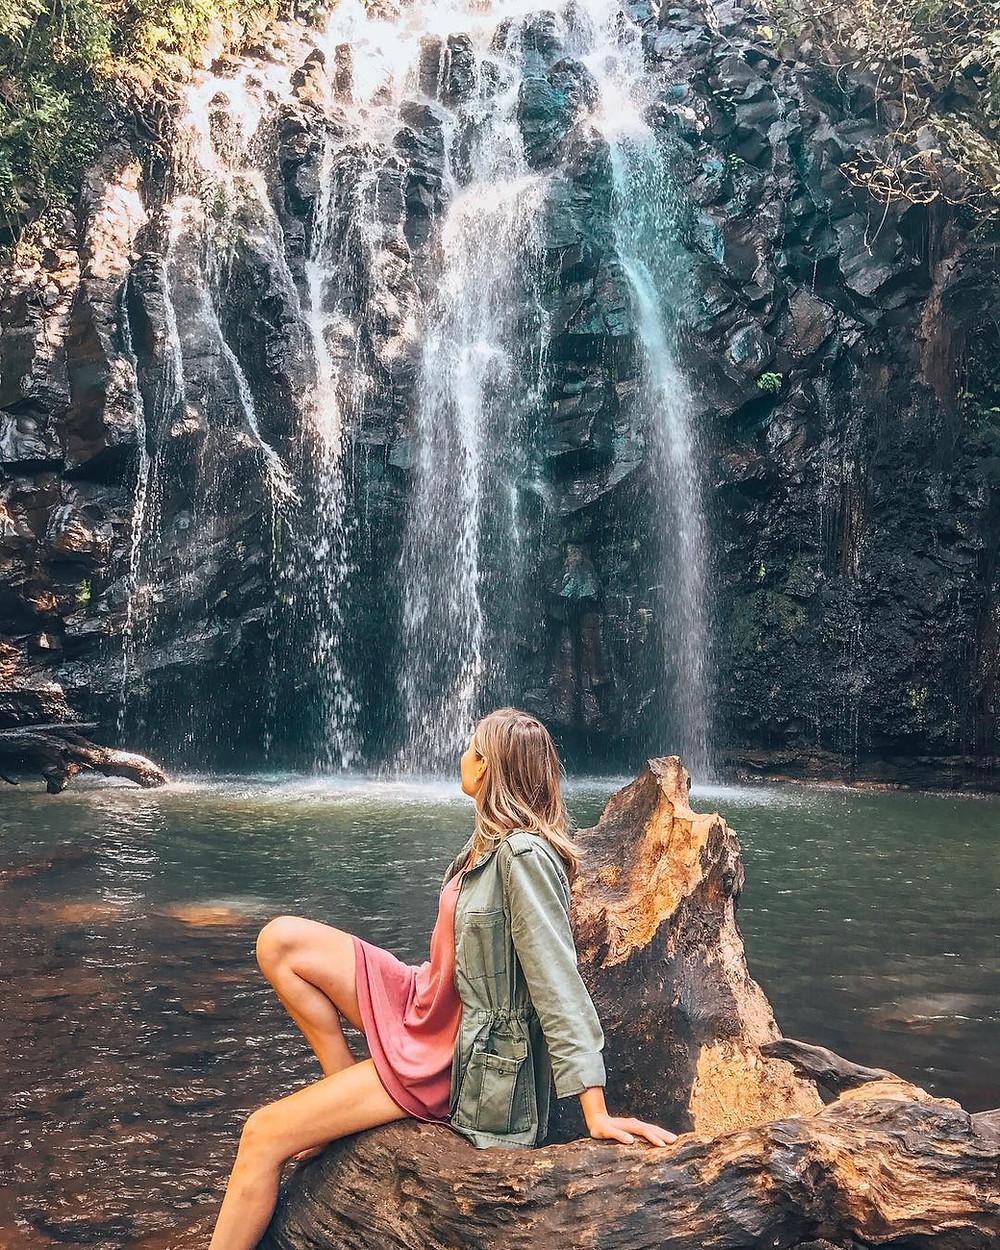 Ellinjaa Falls on the Millaa Millaa waterfall circuit in the Atherton Tablelands in Tropical North Queensland